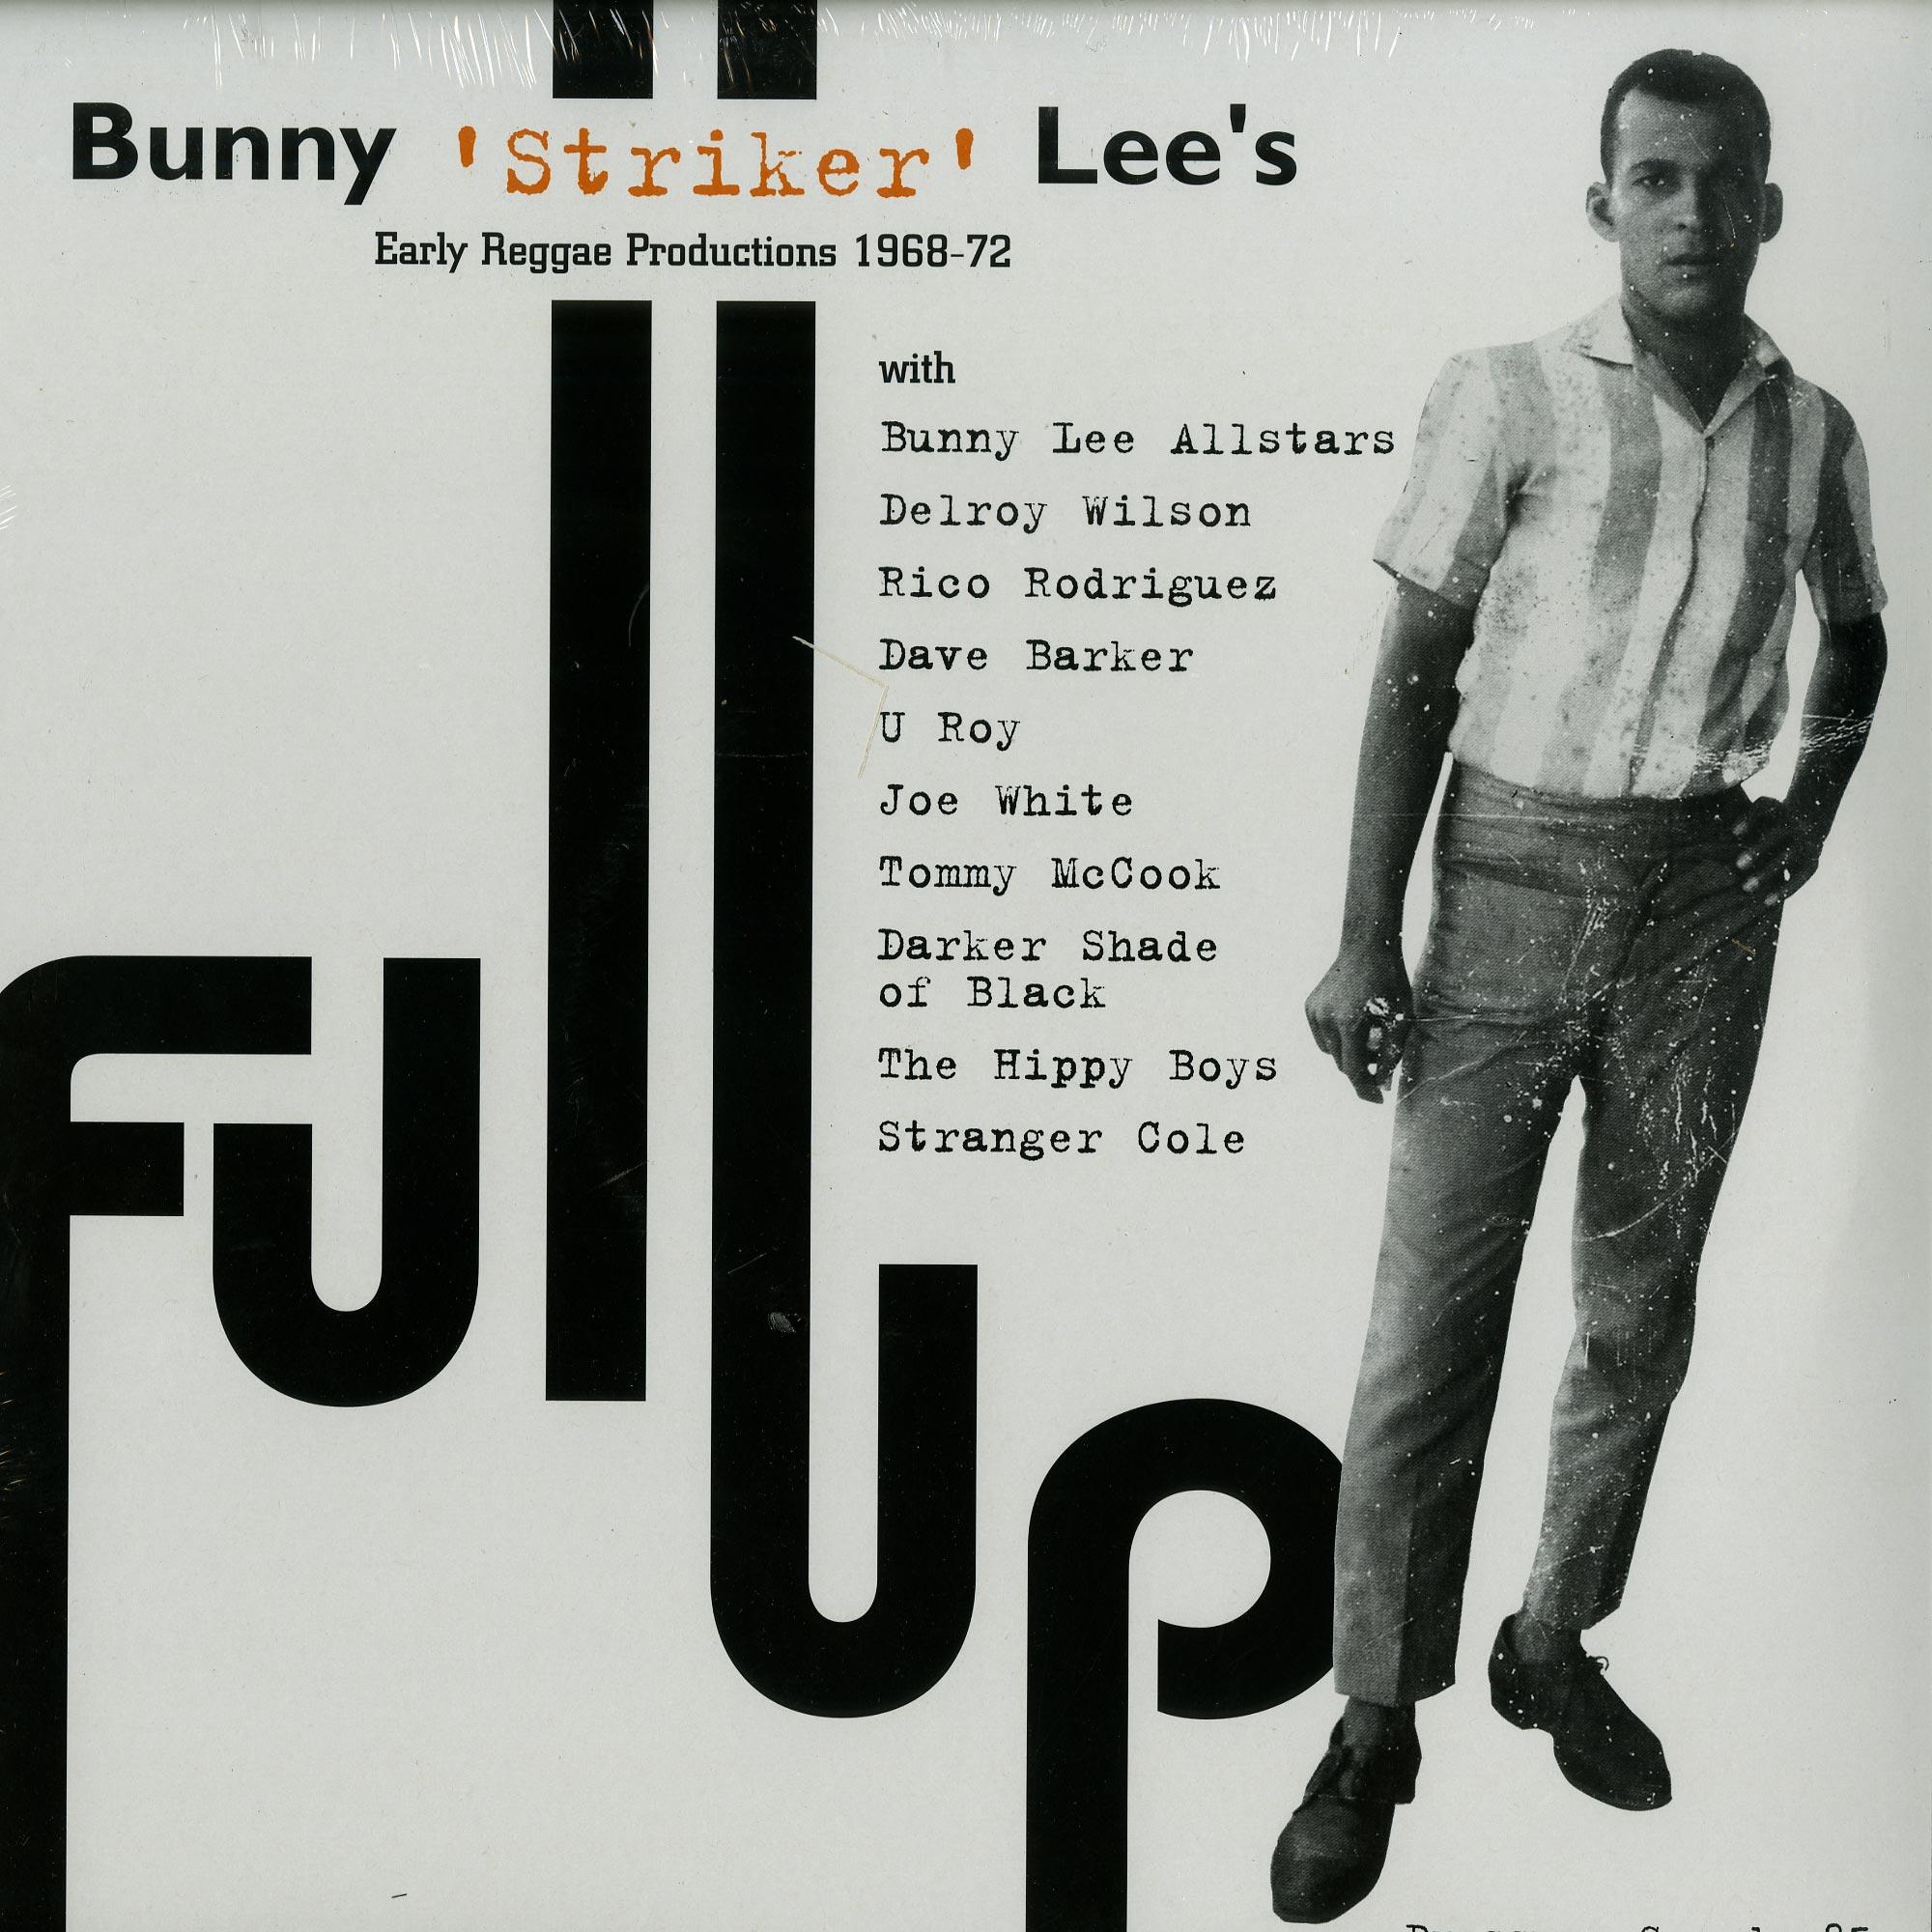 Bunny Striker Lee - FULL UP